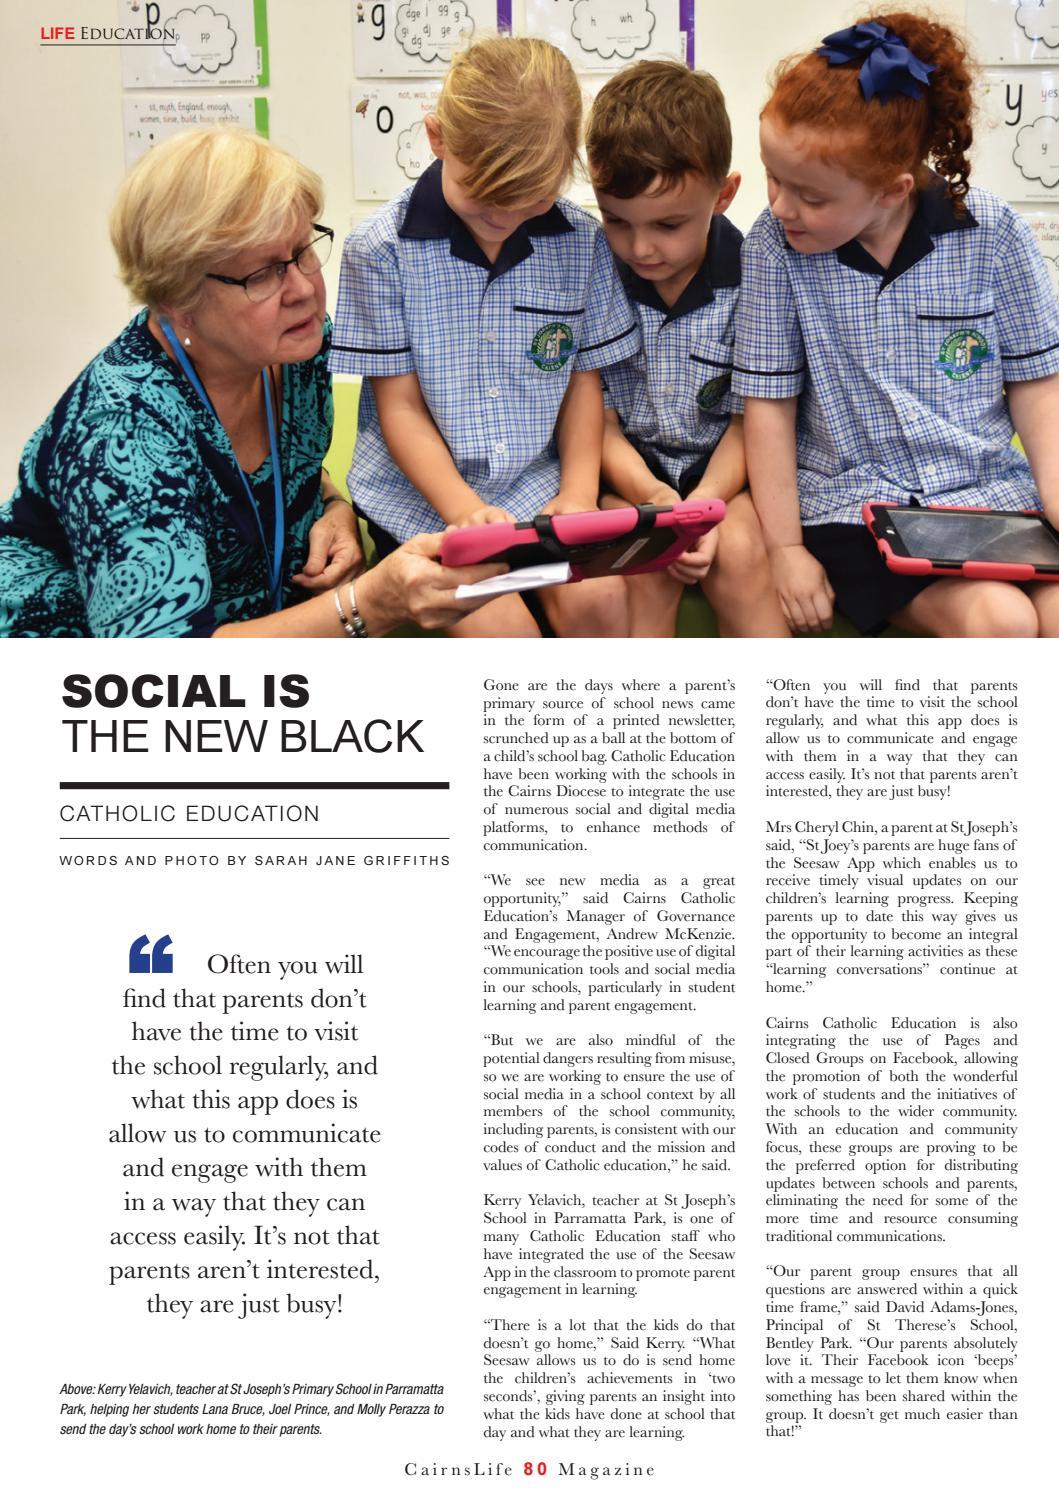 CairnsLife Magazine June 2017 by CityLife - issuu